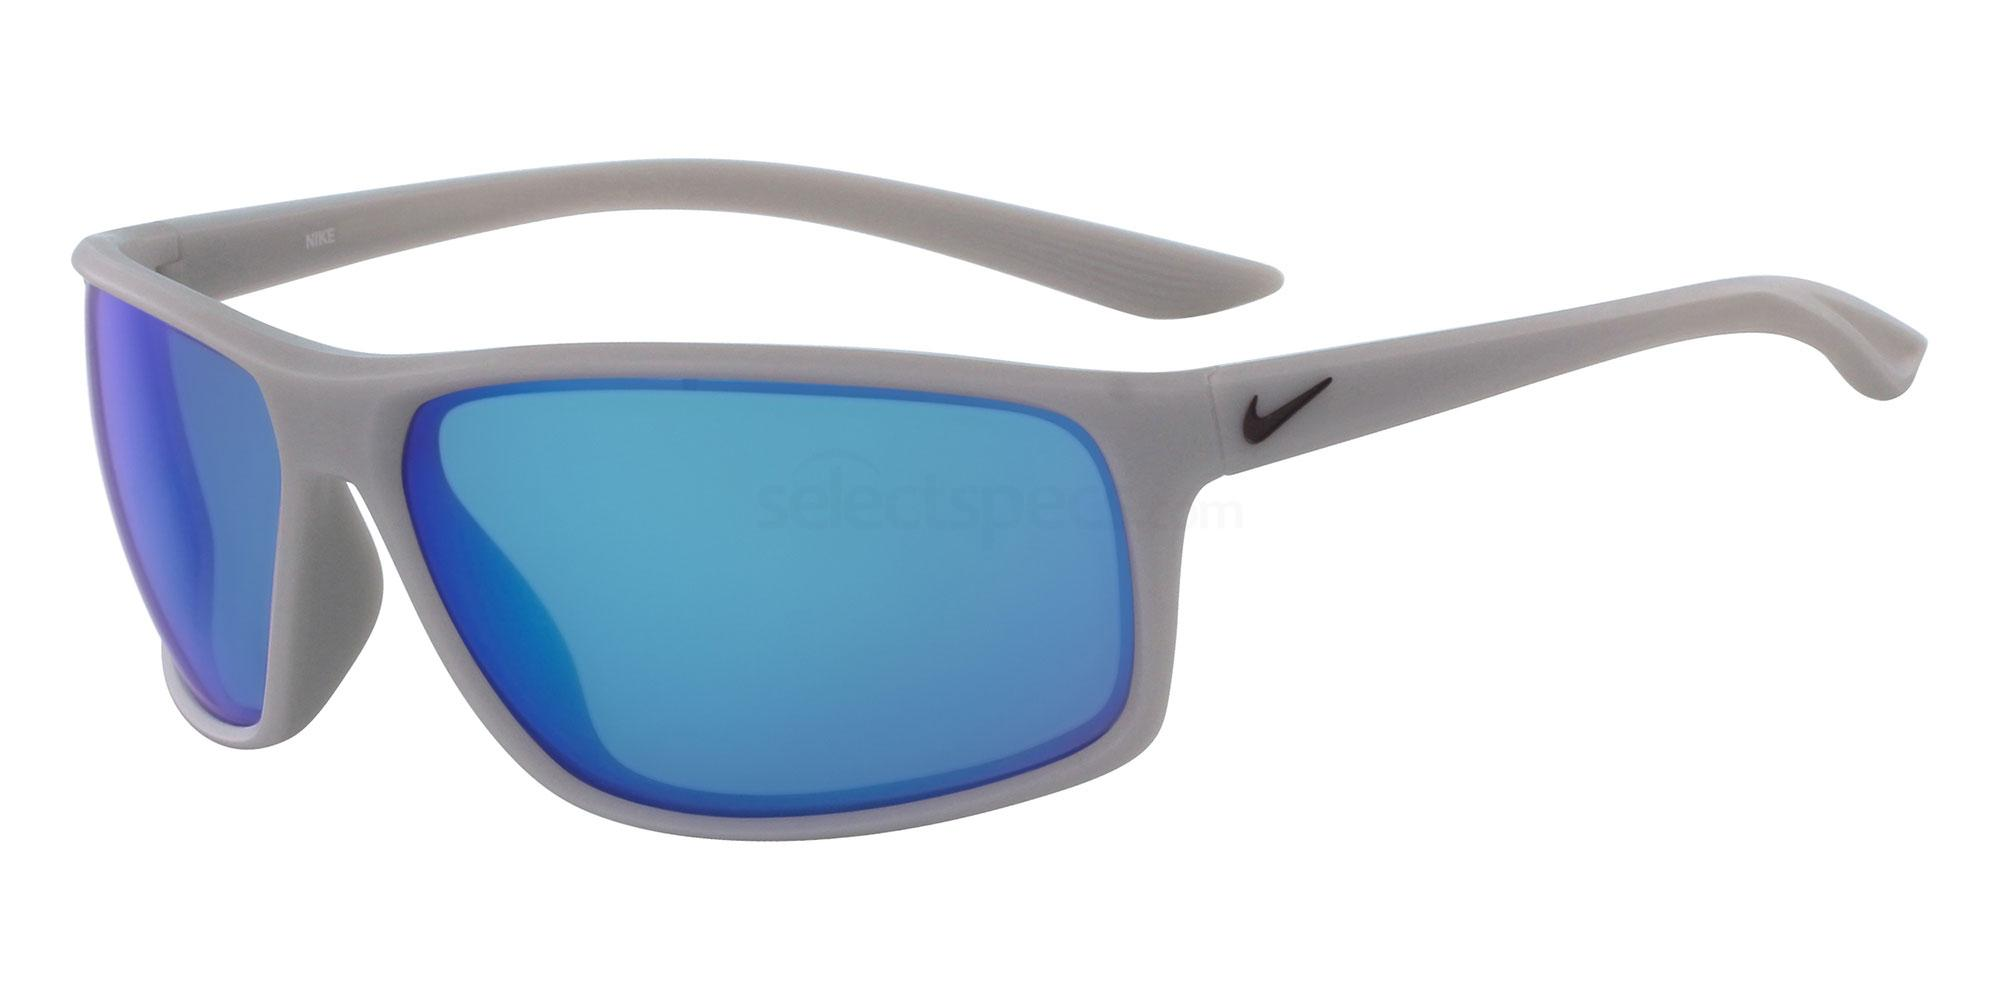 066 ADRENALINE M EV1113 Sunglasses, Nike